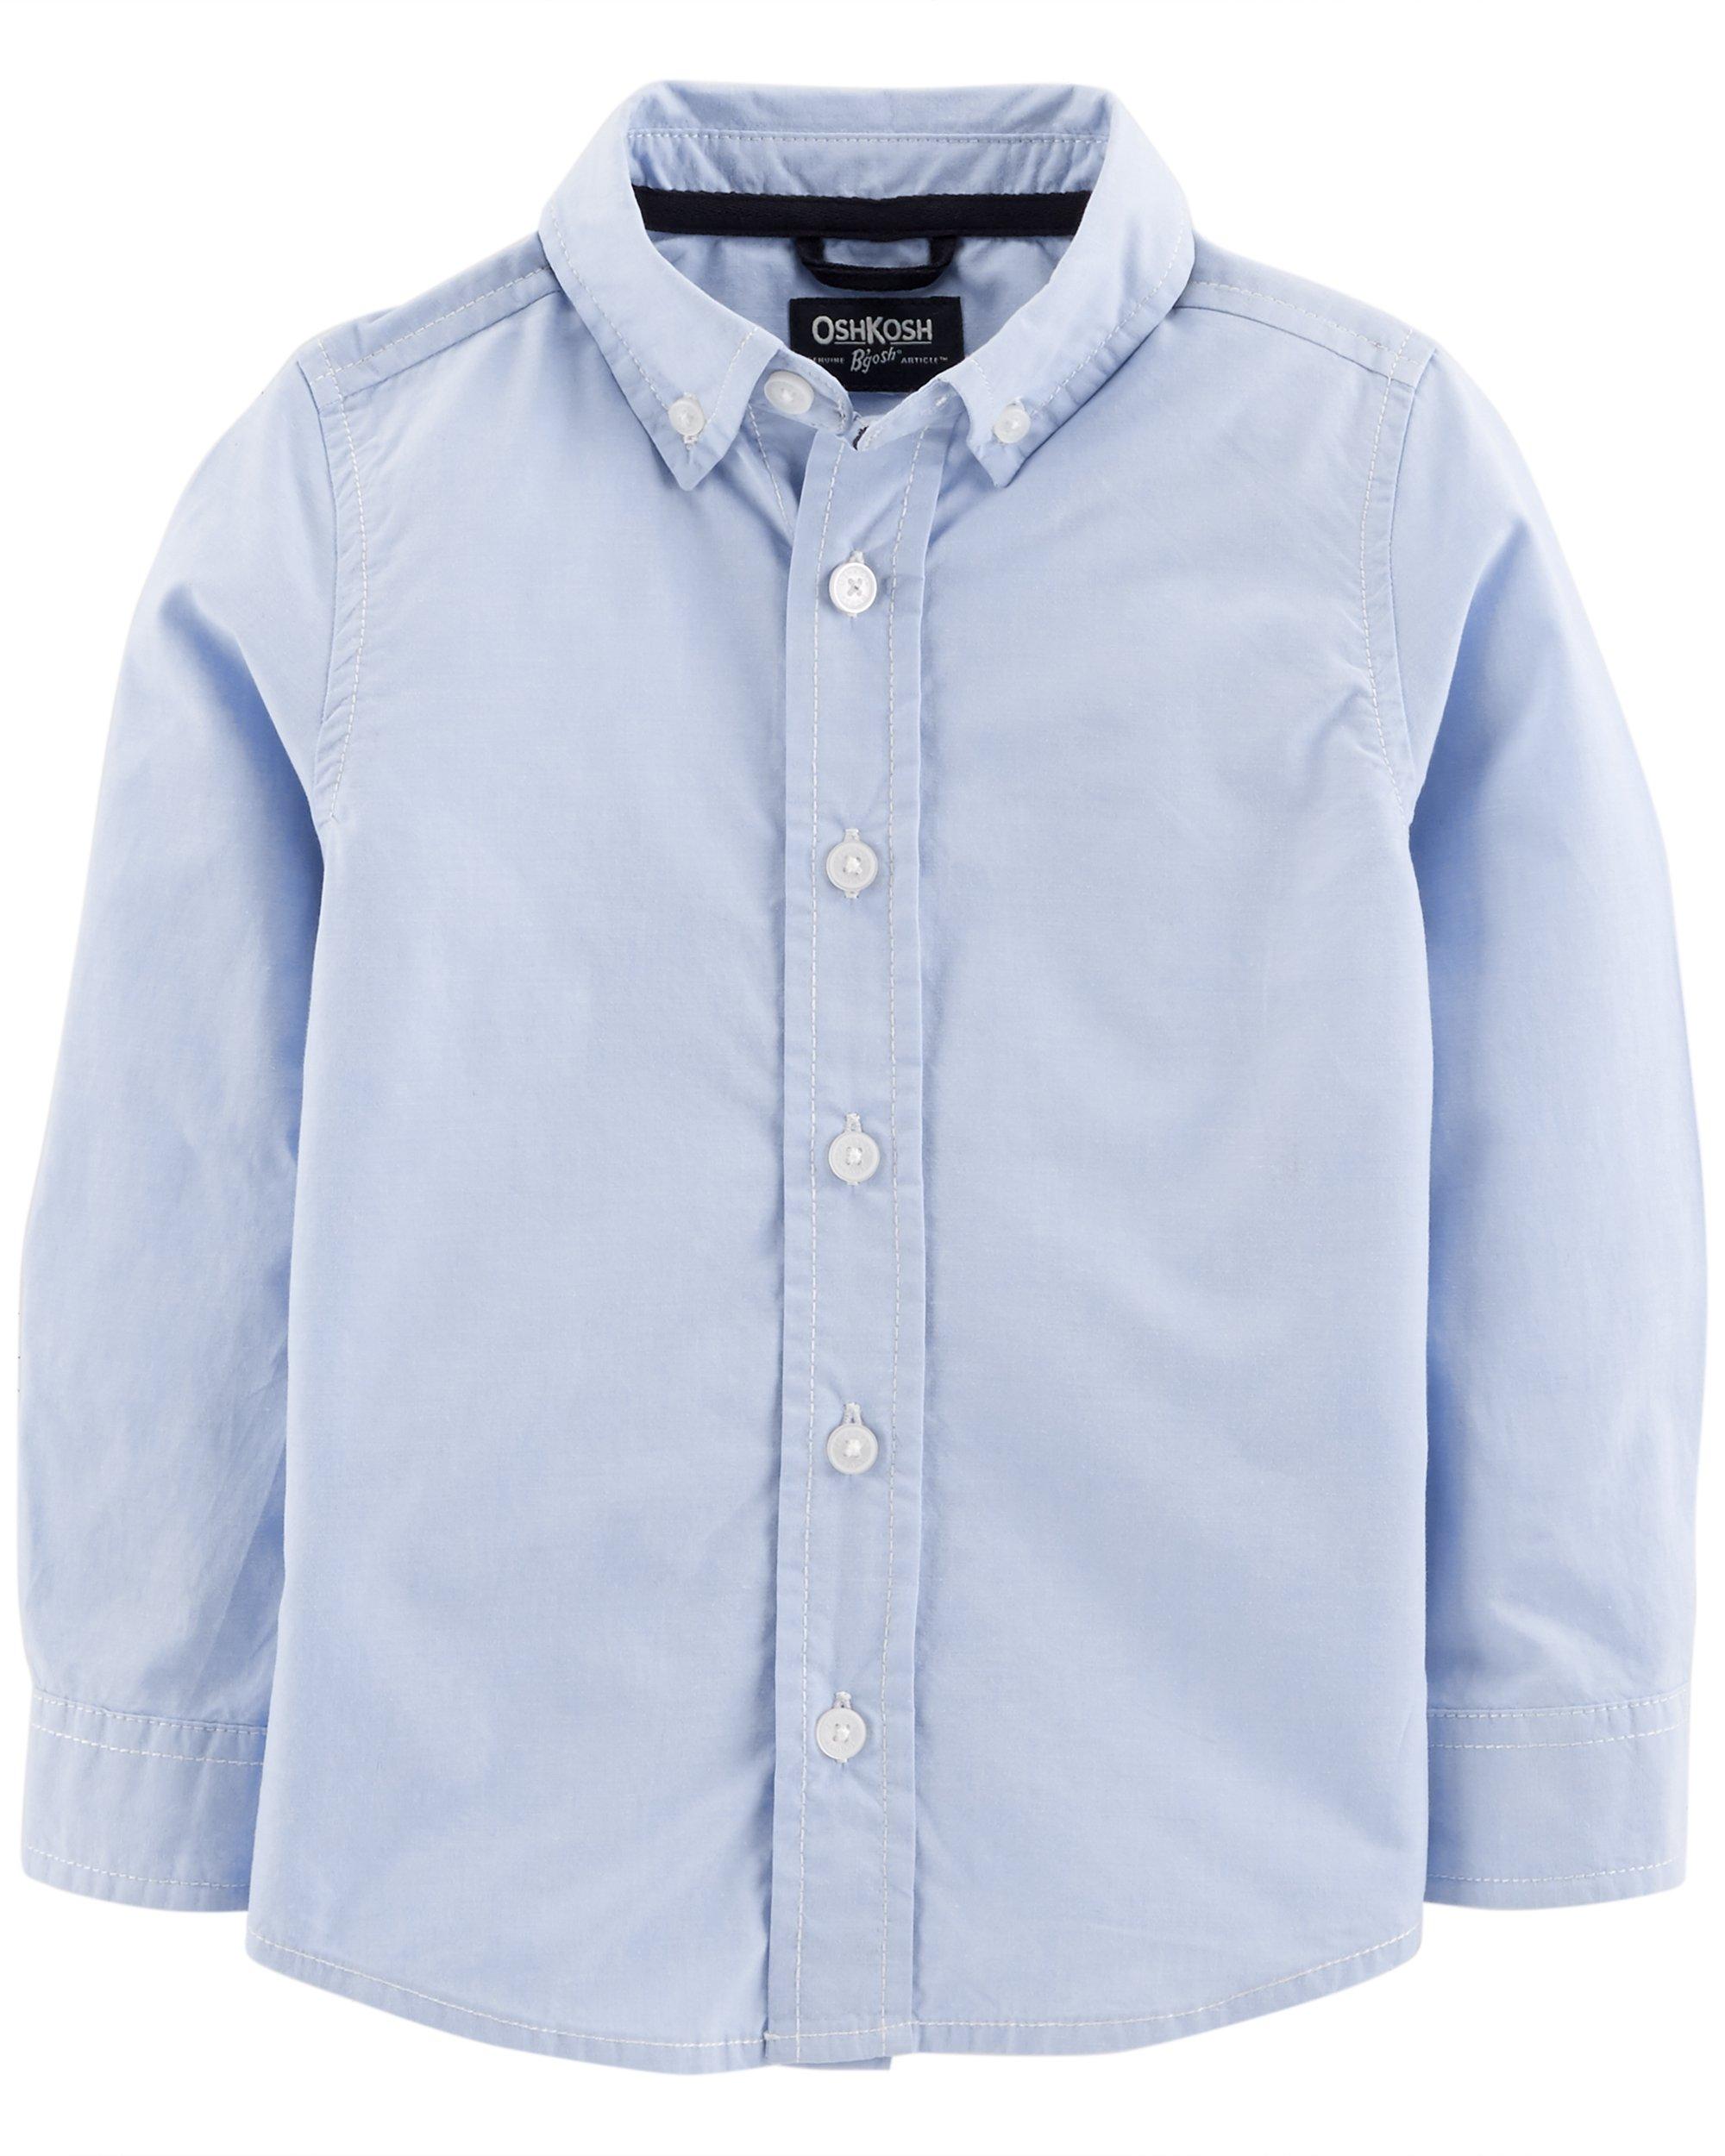 Osh Kosh Boys' Toddler Button-Front Shirt, Blue, 3T